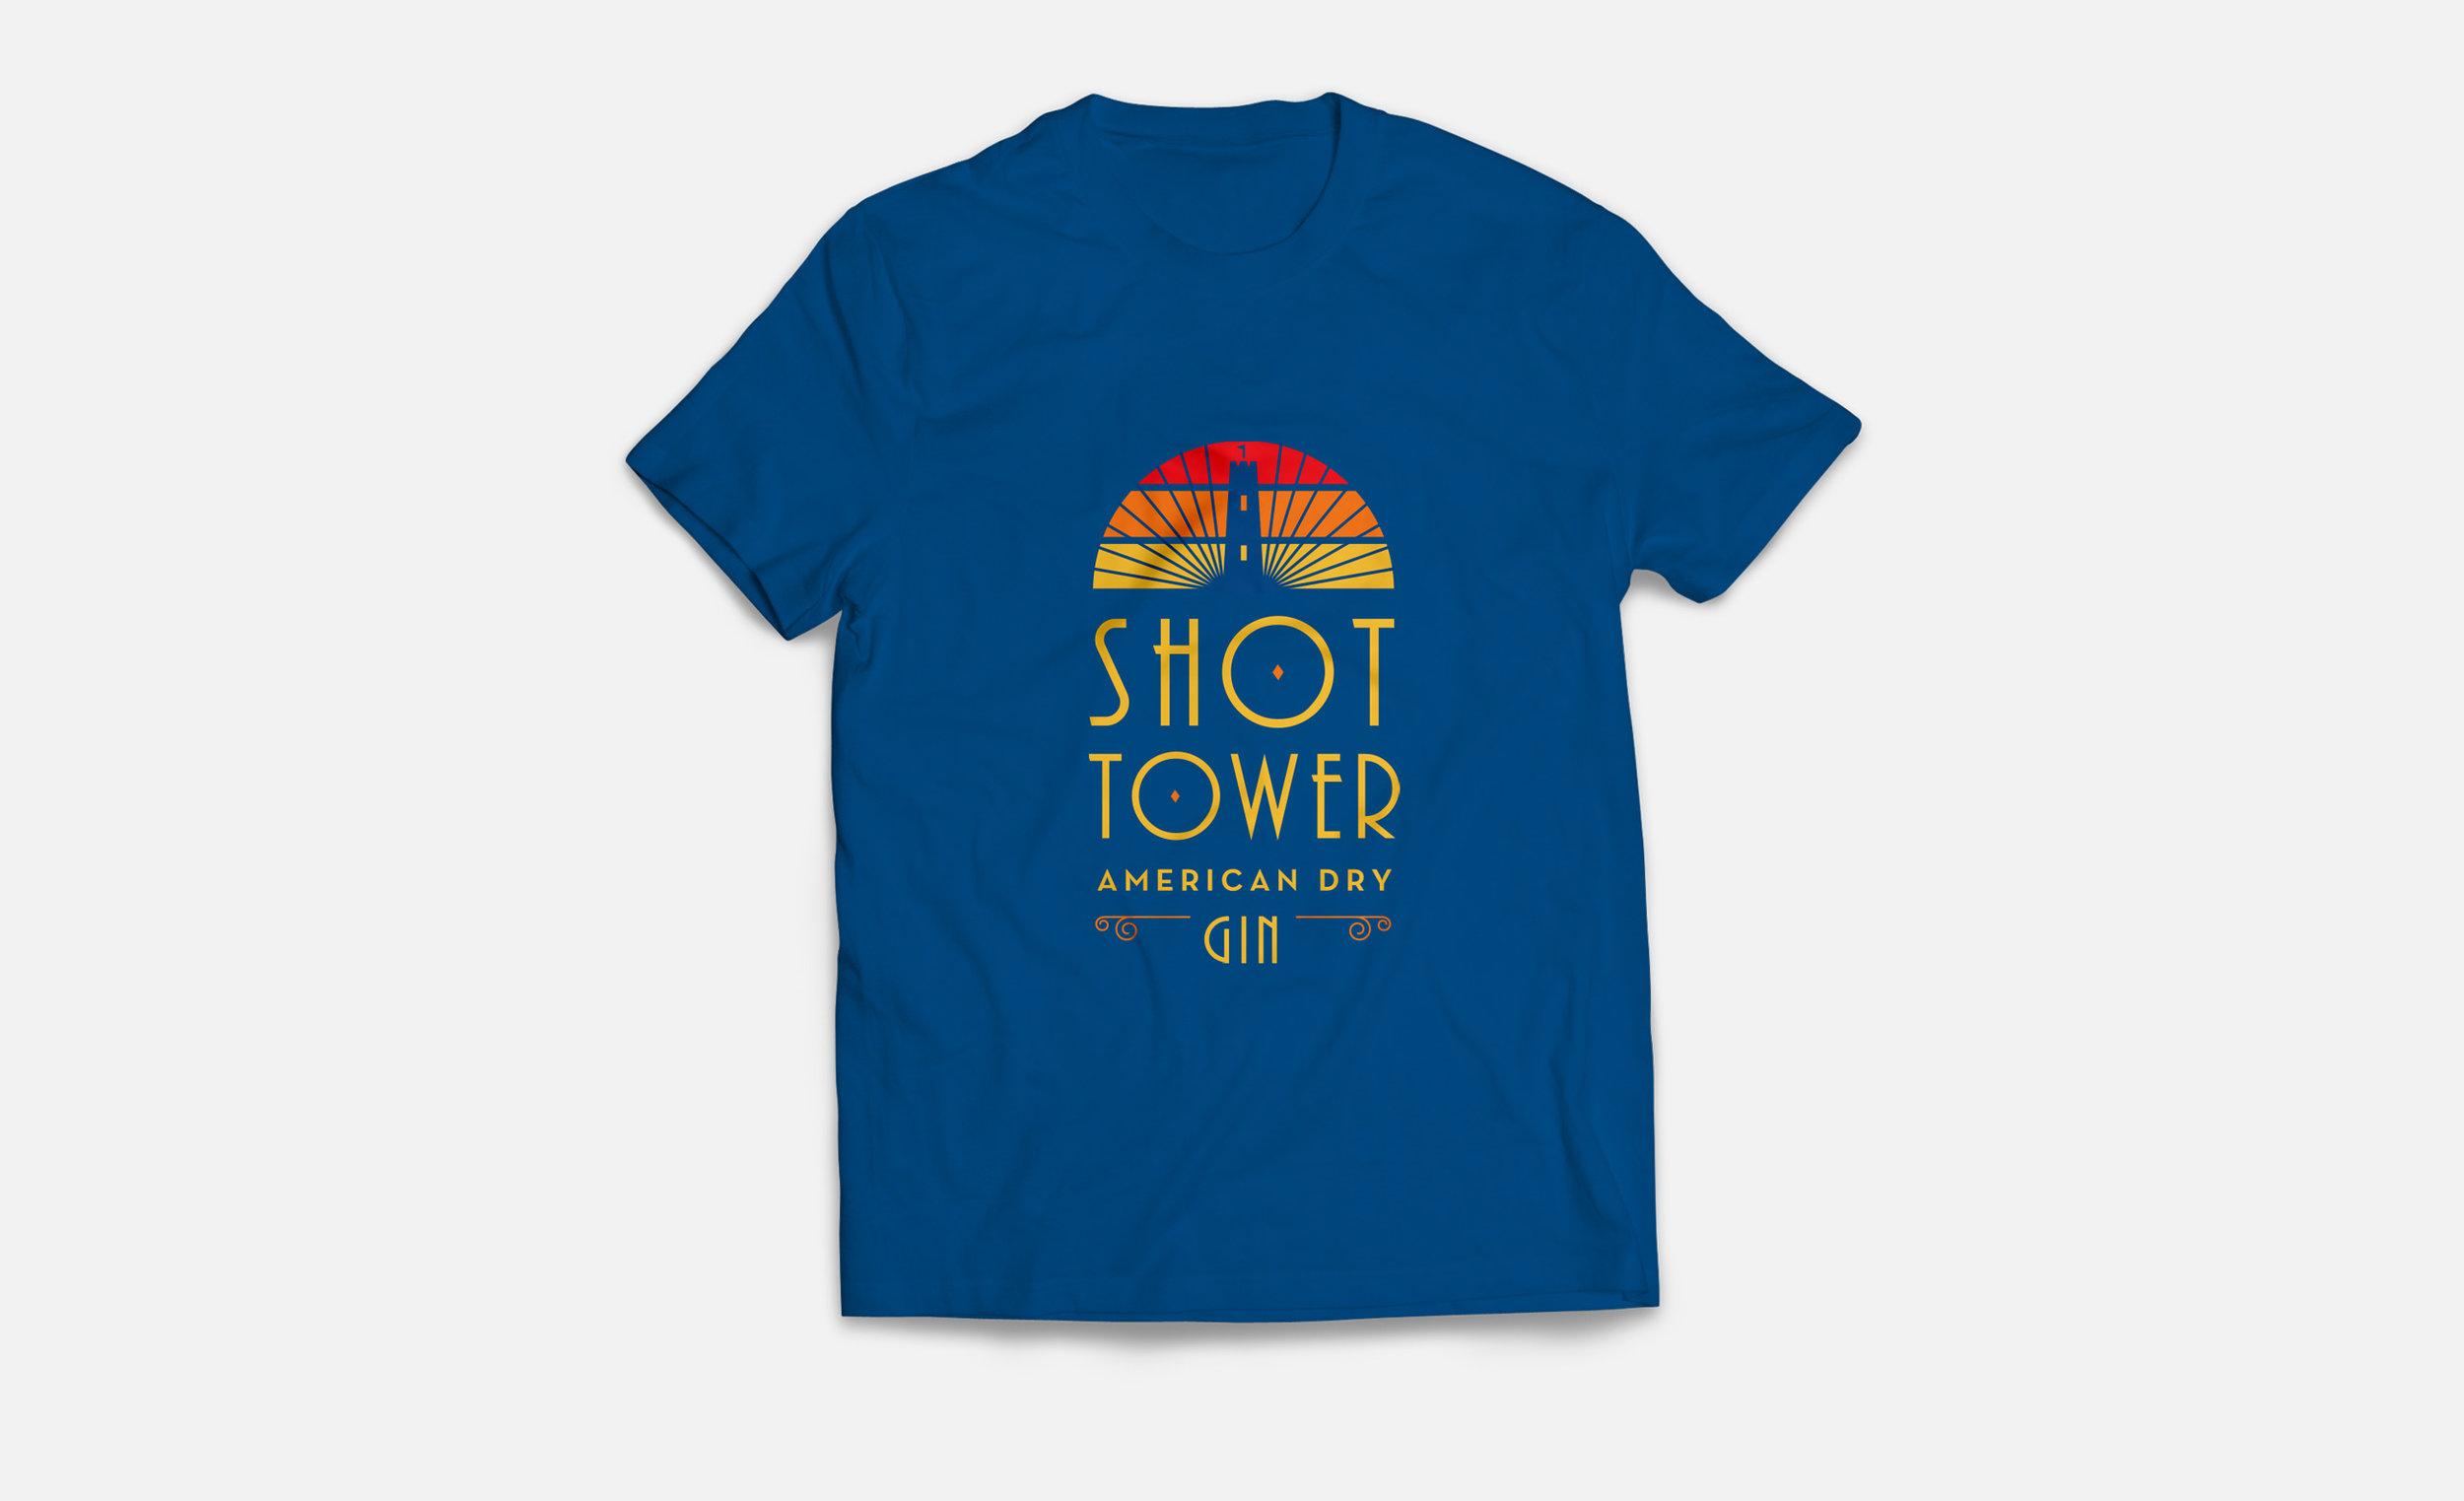 Baltimore Spirits Company: Shot Tower Gin Shirt Design